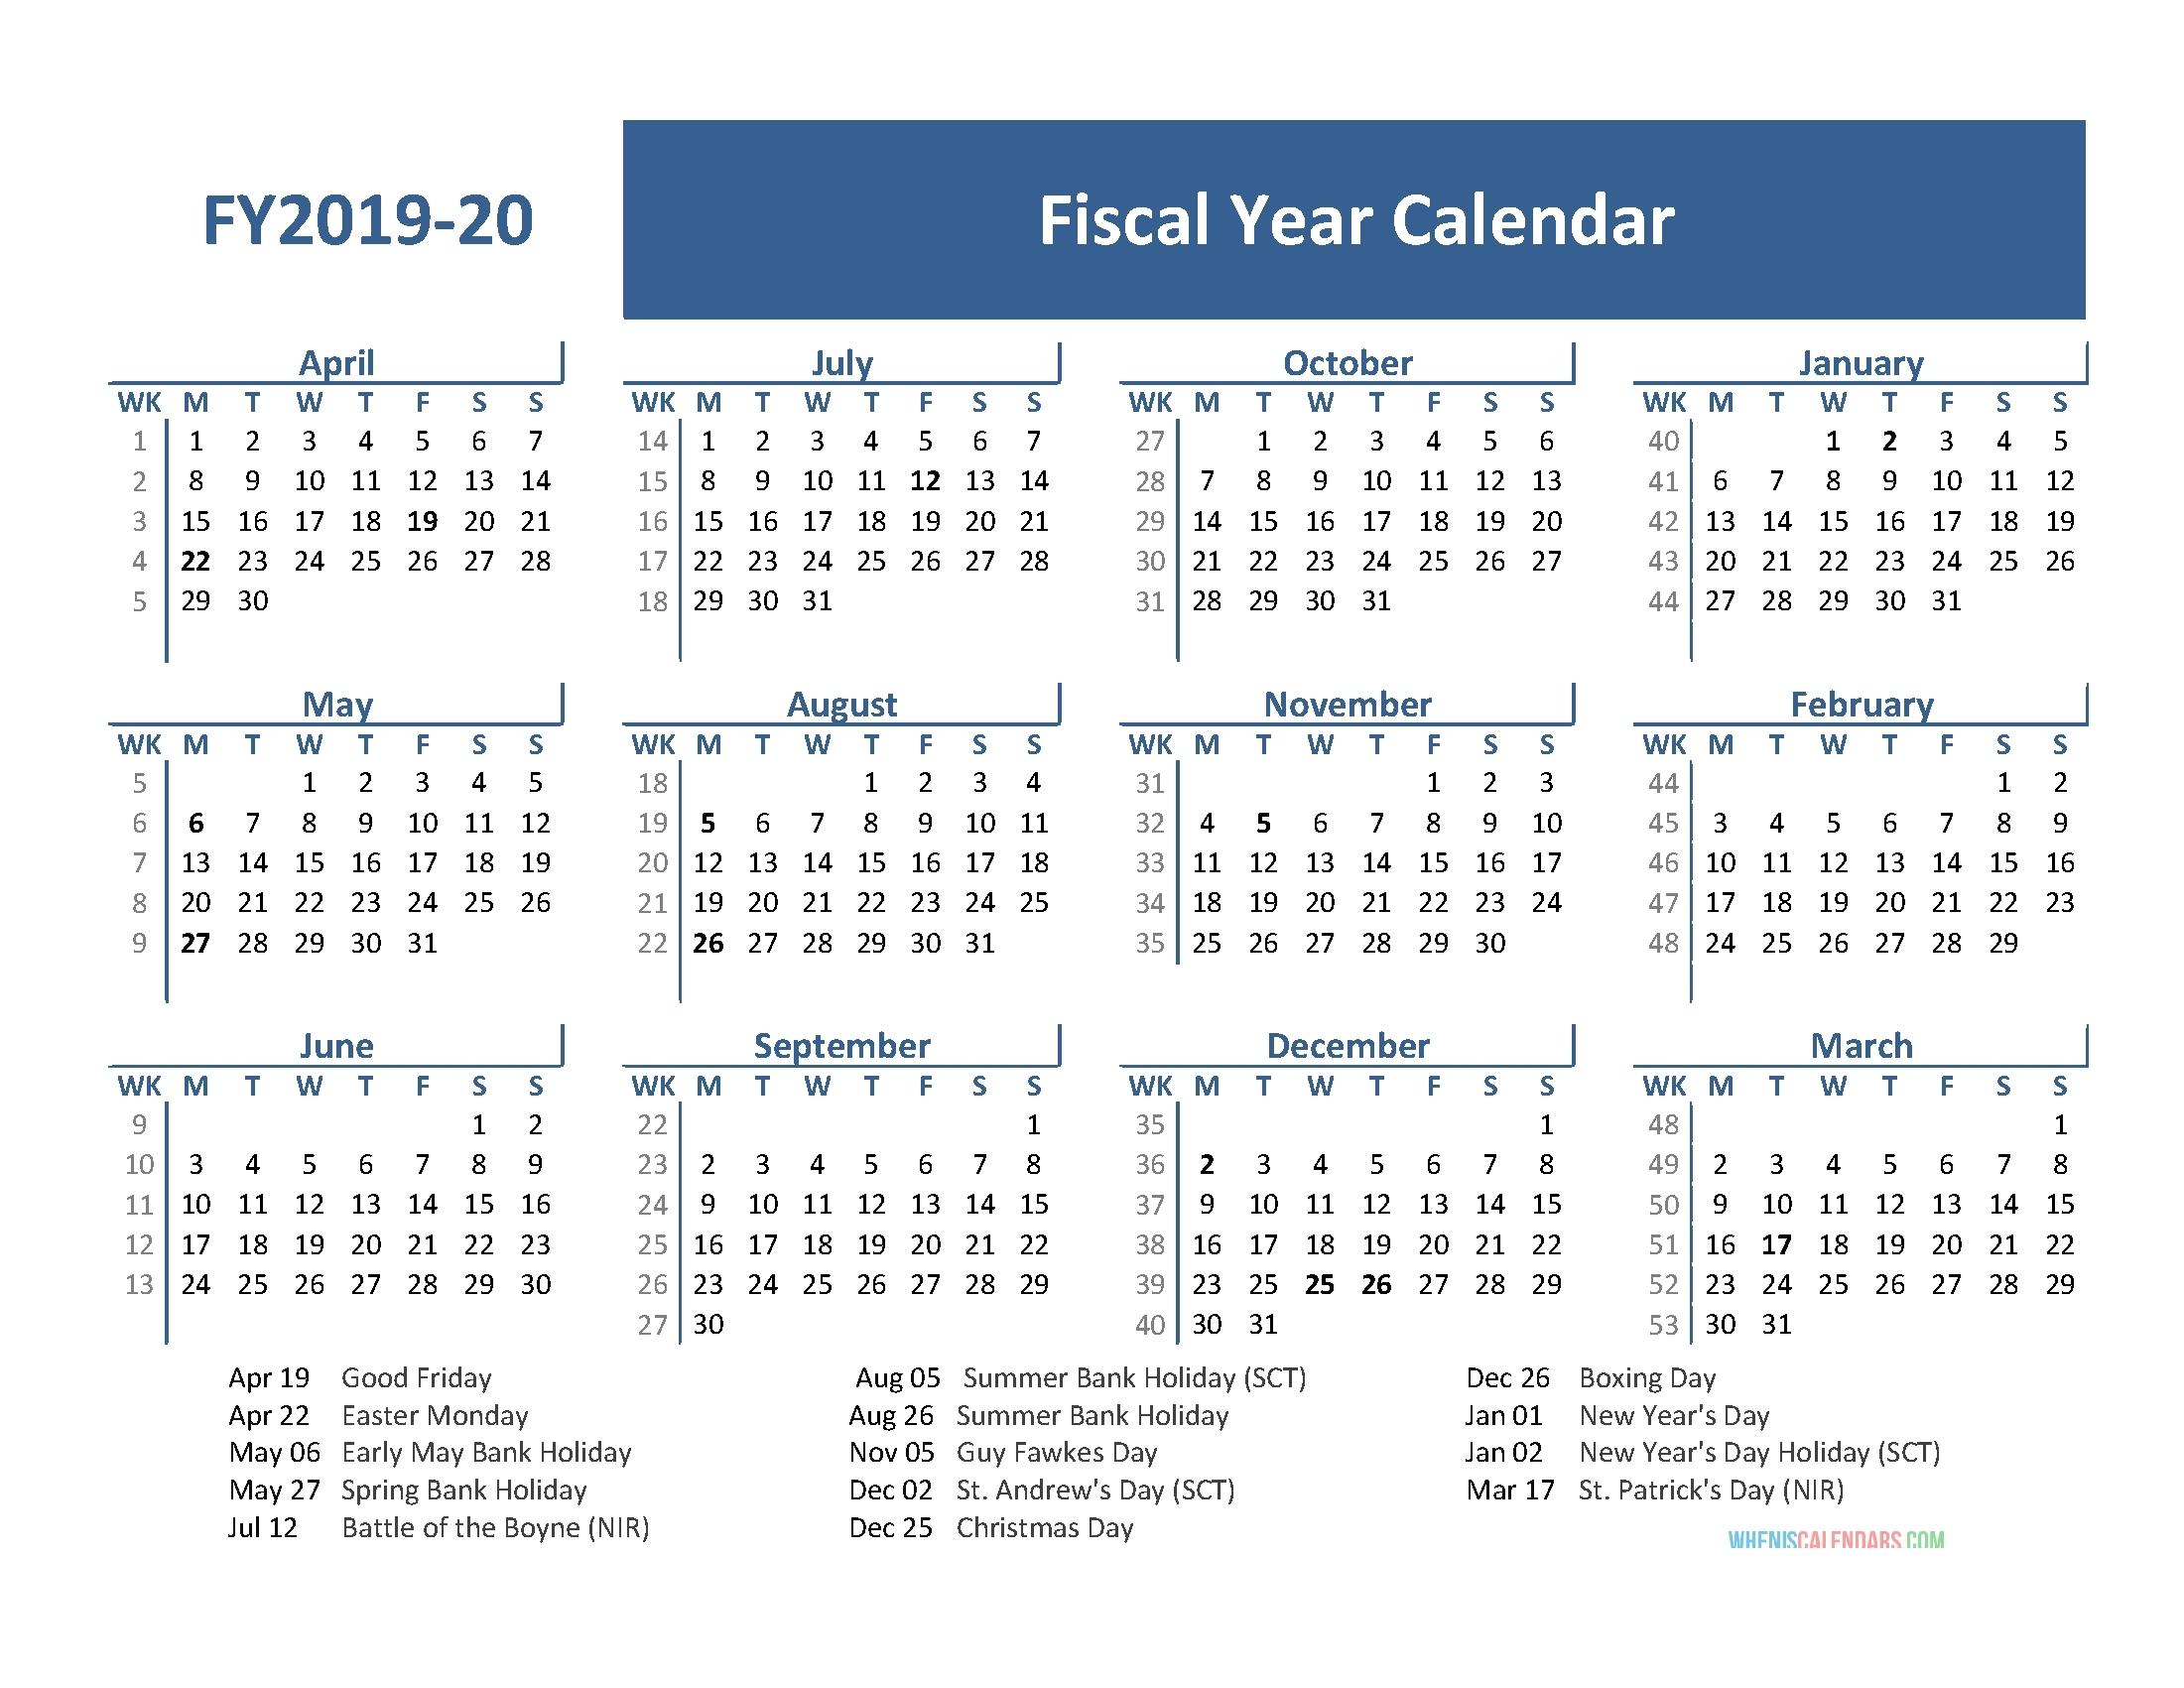 2019-2020 Calendar Financial Week Numbers - Calendar within Financial Year Week Numbers 2019